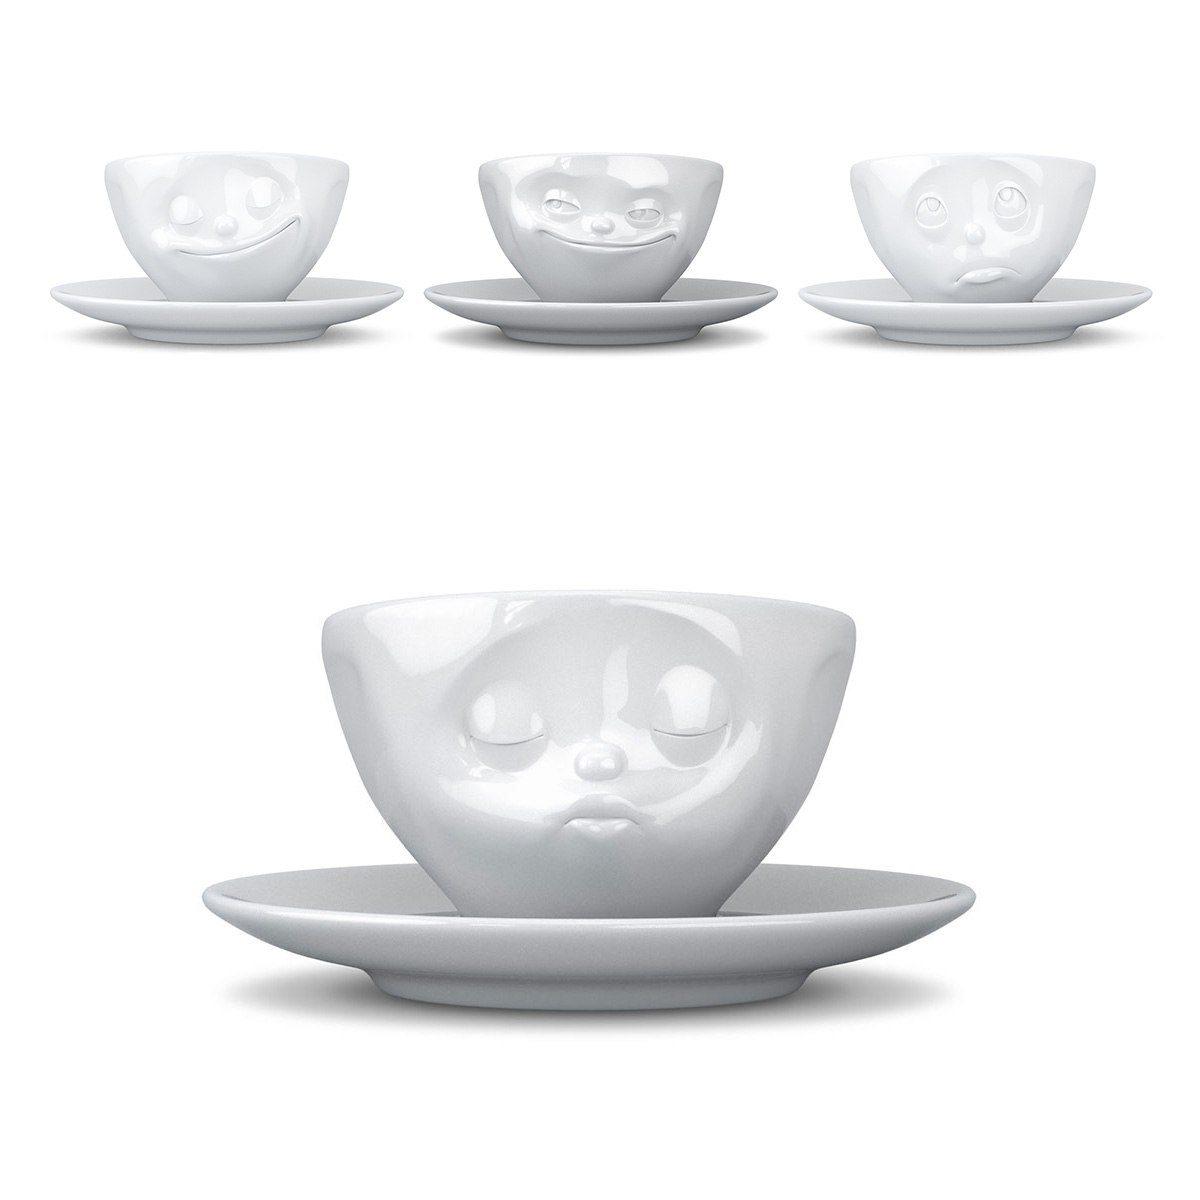 Espresso-Tasse für jede Laune